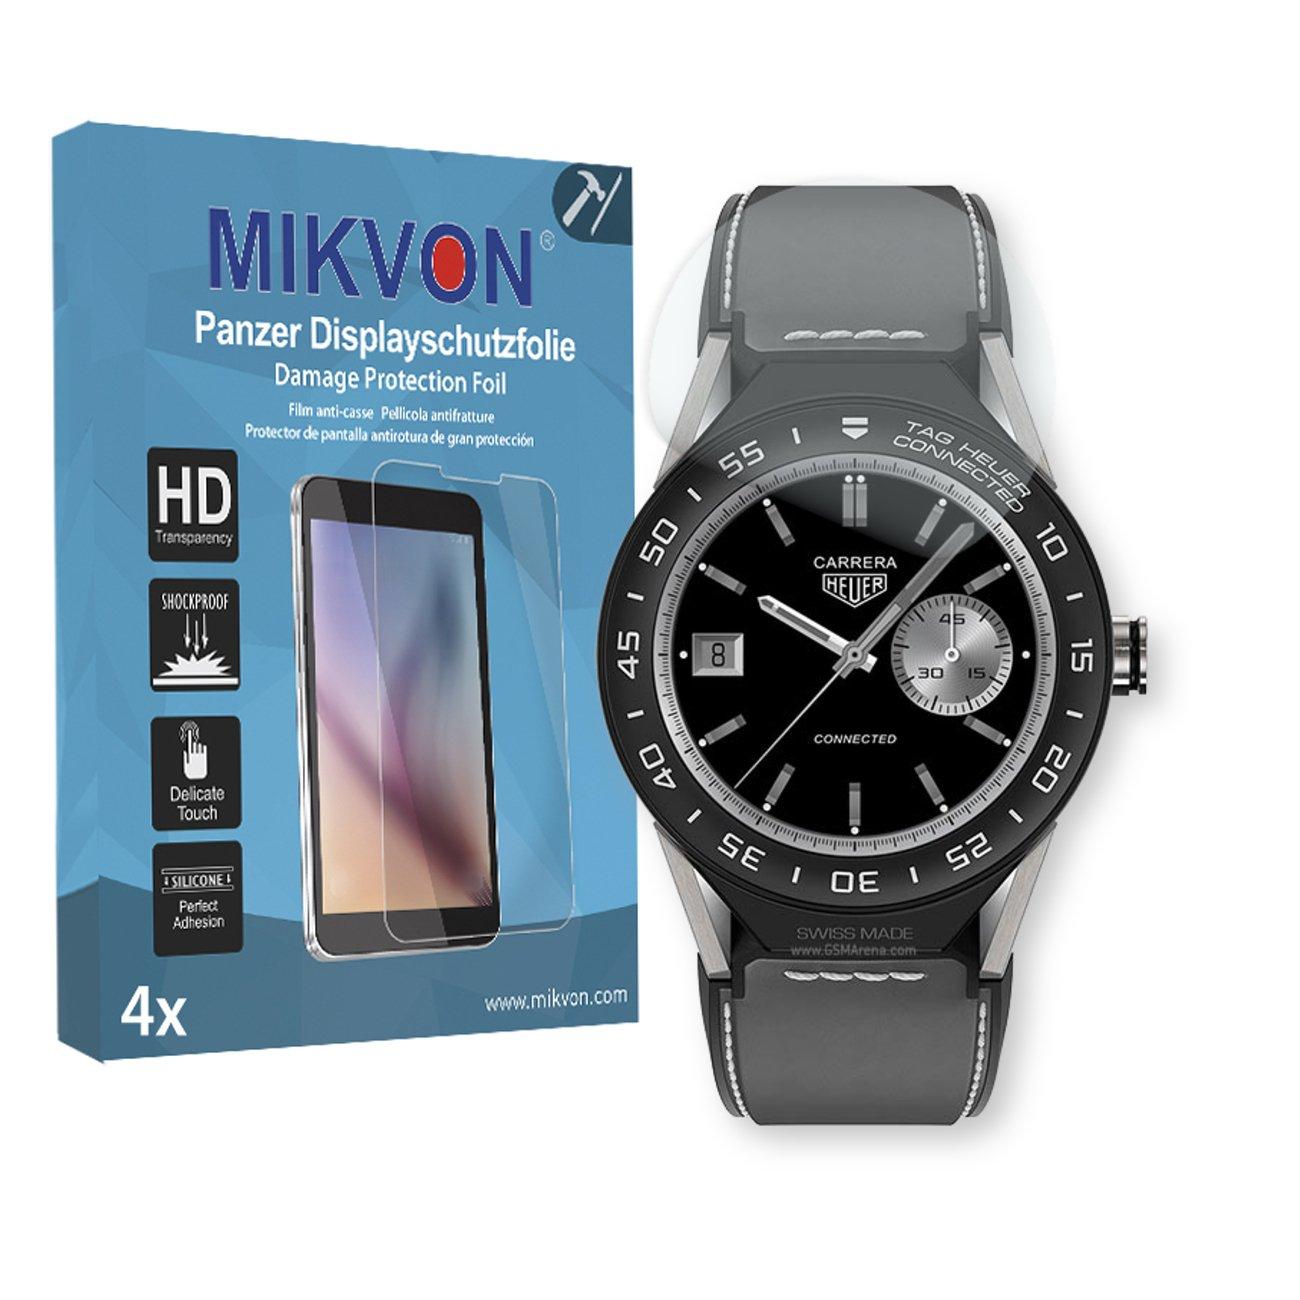 Mikvon 4X Película blindada protección de Pantalla Tag Heuer ...